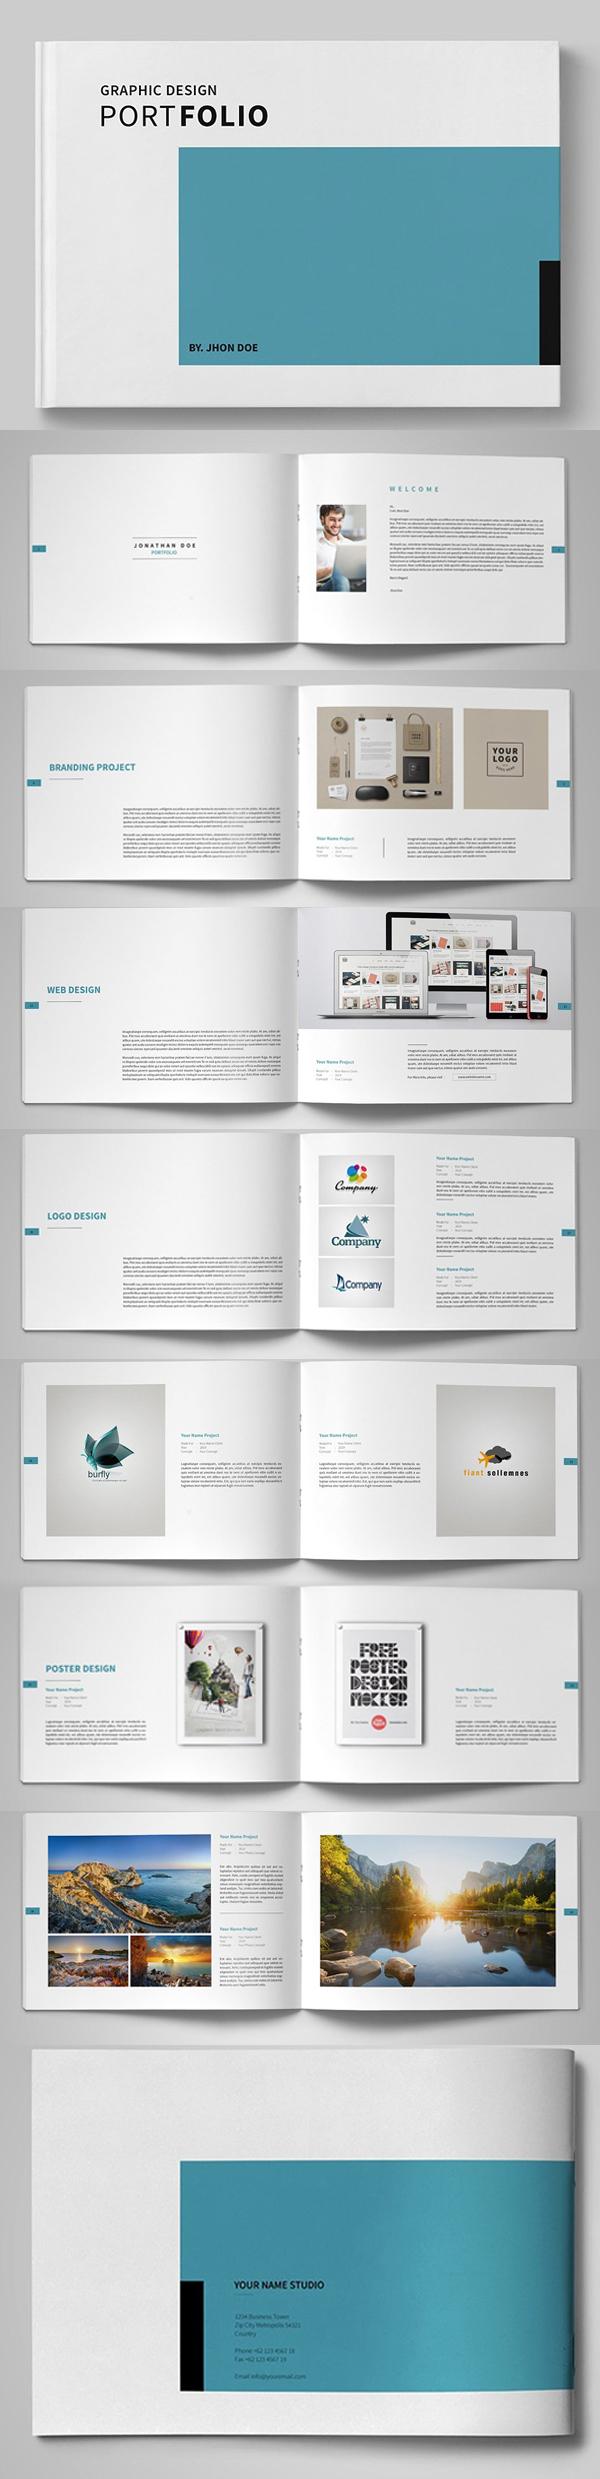 Graphic Design Portfolio Brochure Template